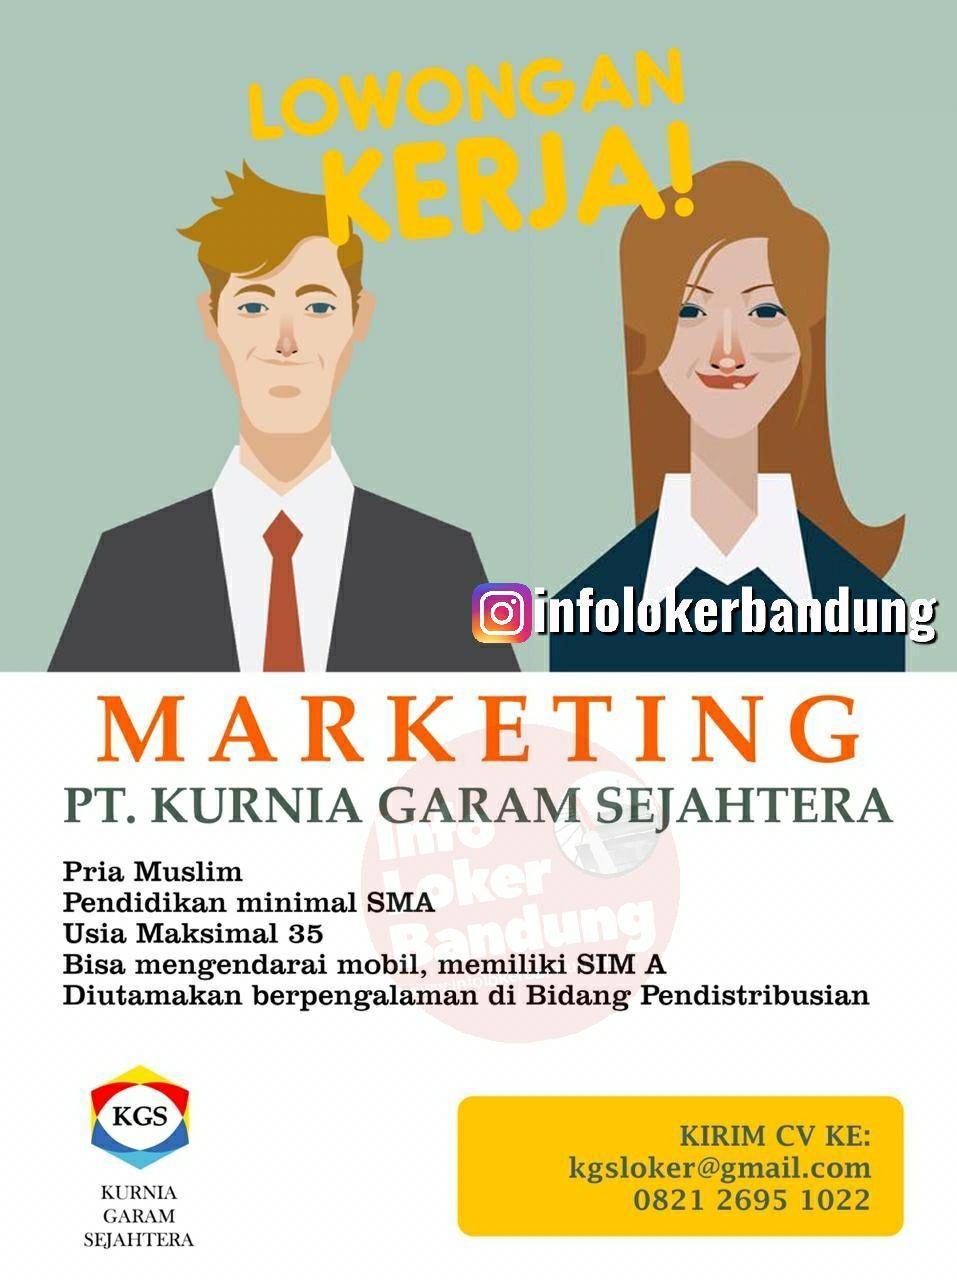 Lowongan Kerja PT. Kurnia Garam Sejahtera Bandung September 2019